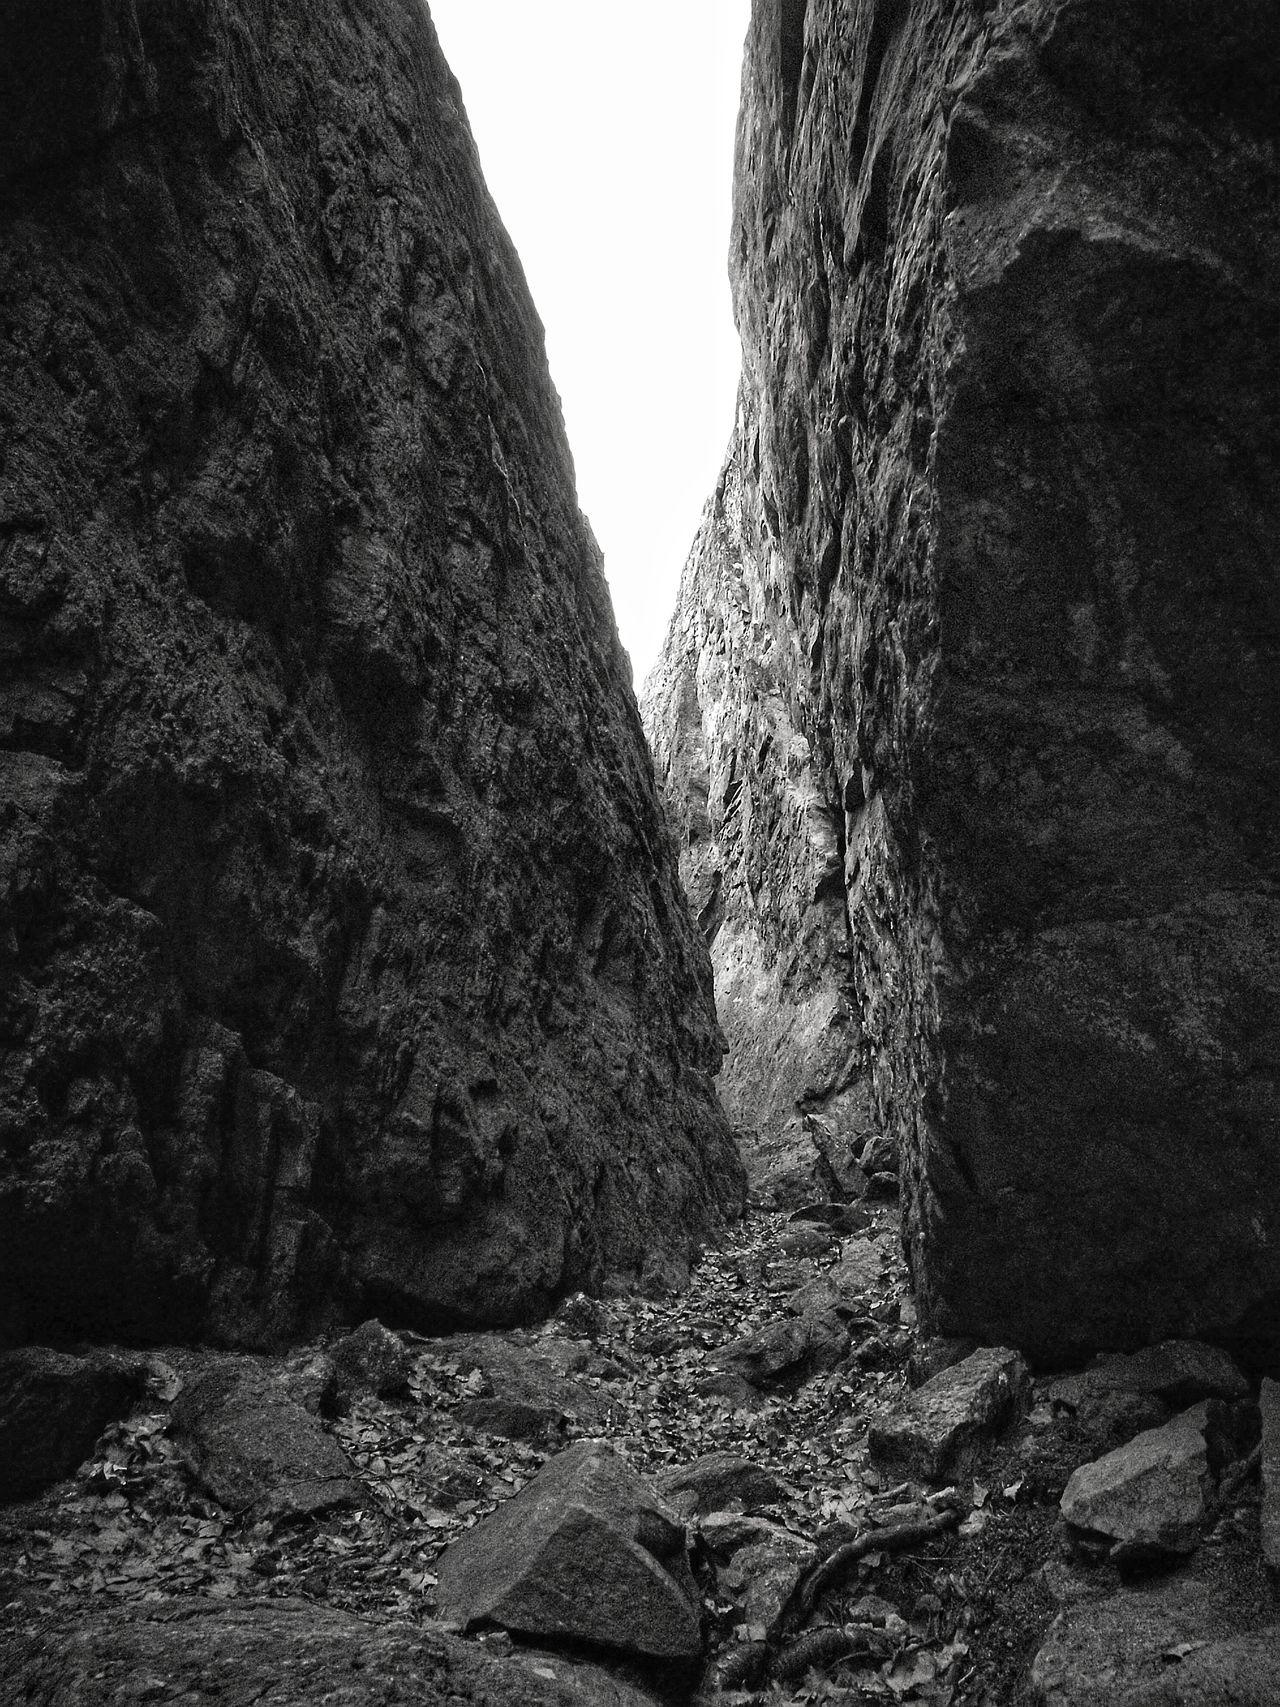 No People Sky Nature Rock Formation Cliffside Cliff Cliff Edge Finland HuaweiP9 Visitfinland Thisisfinland Photoart Naturelovers Mordor Blackandwhite Masku